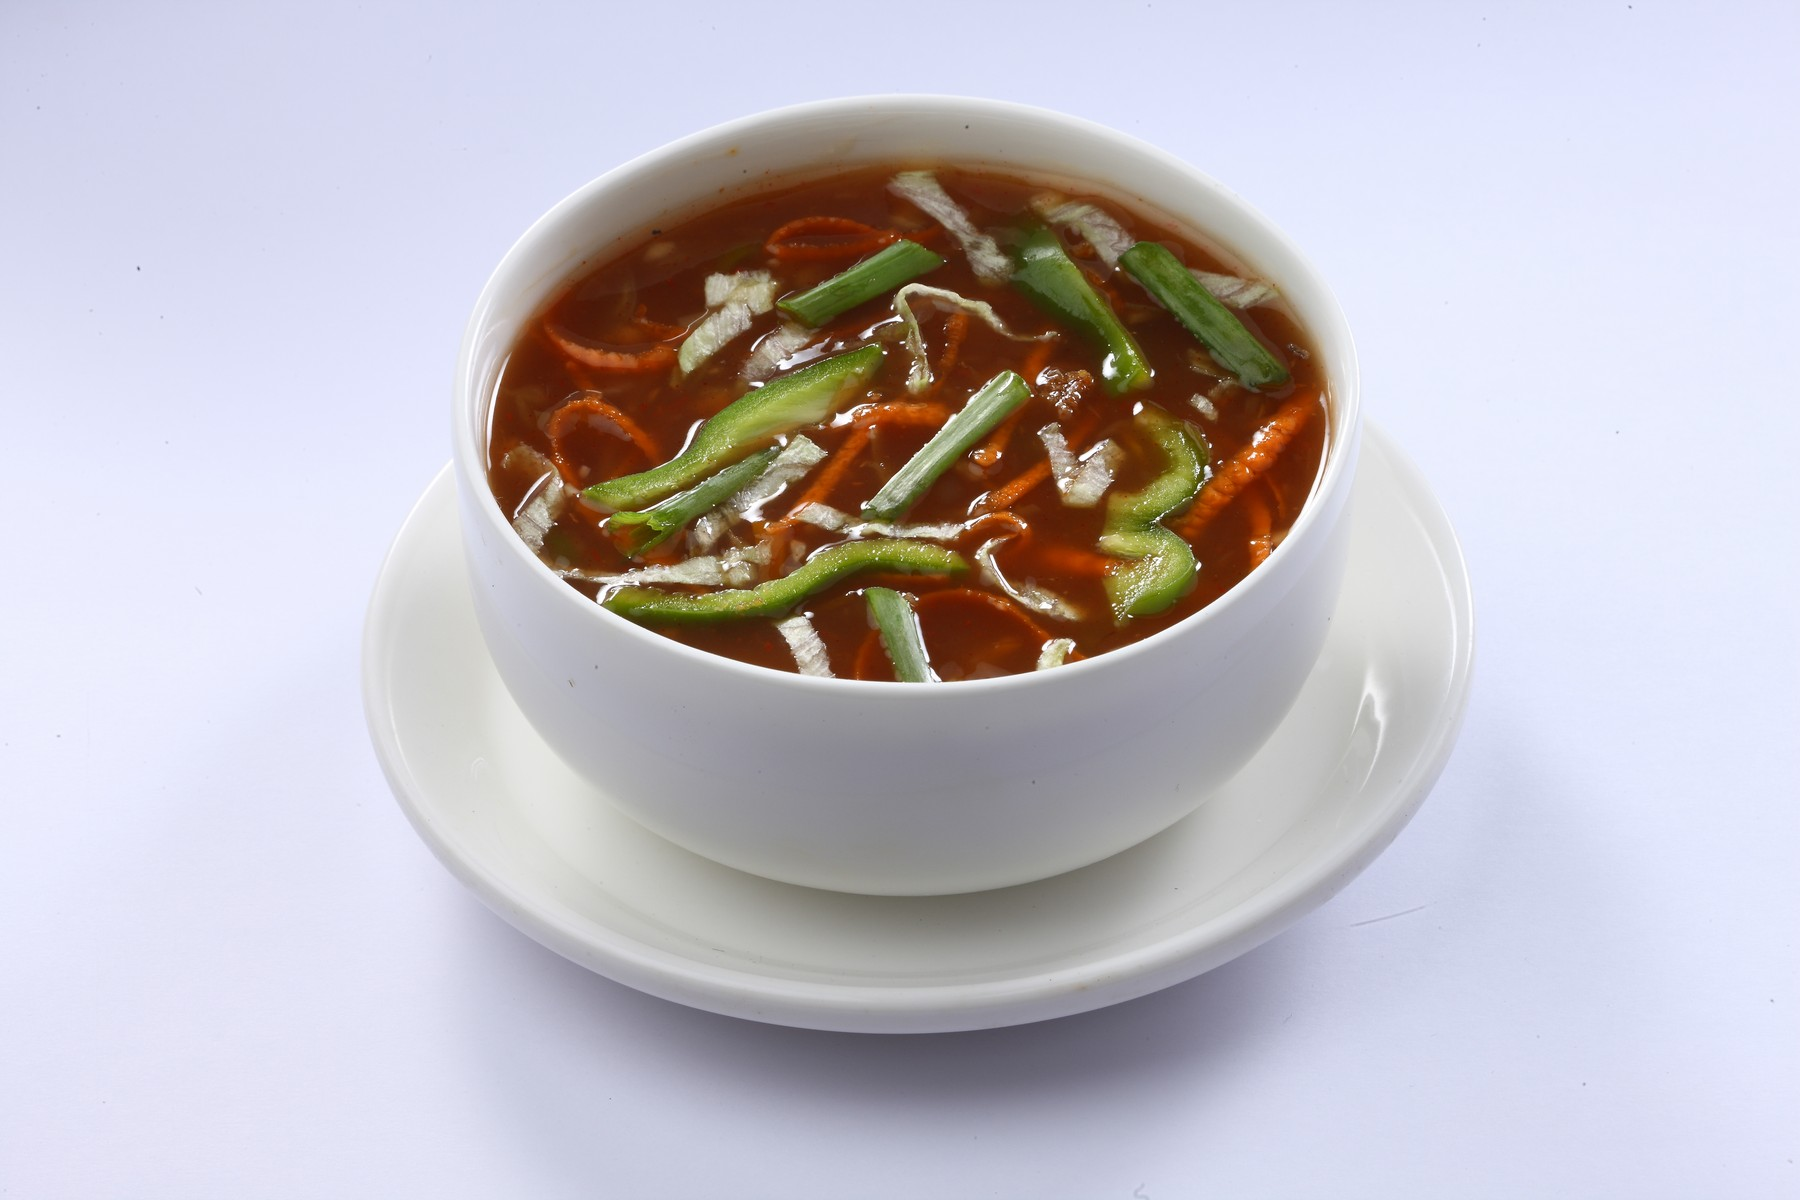 Hot and Sour Soup Veg Image